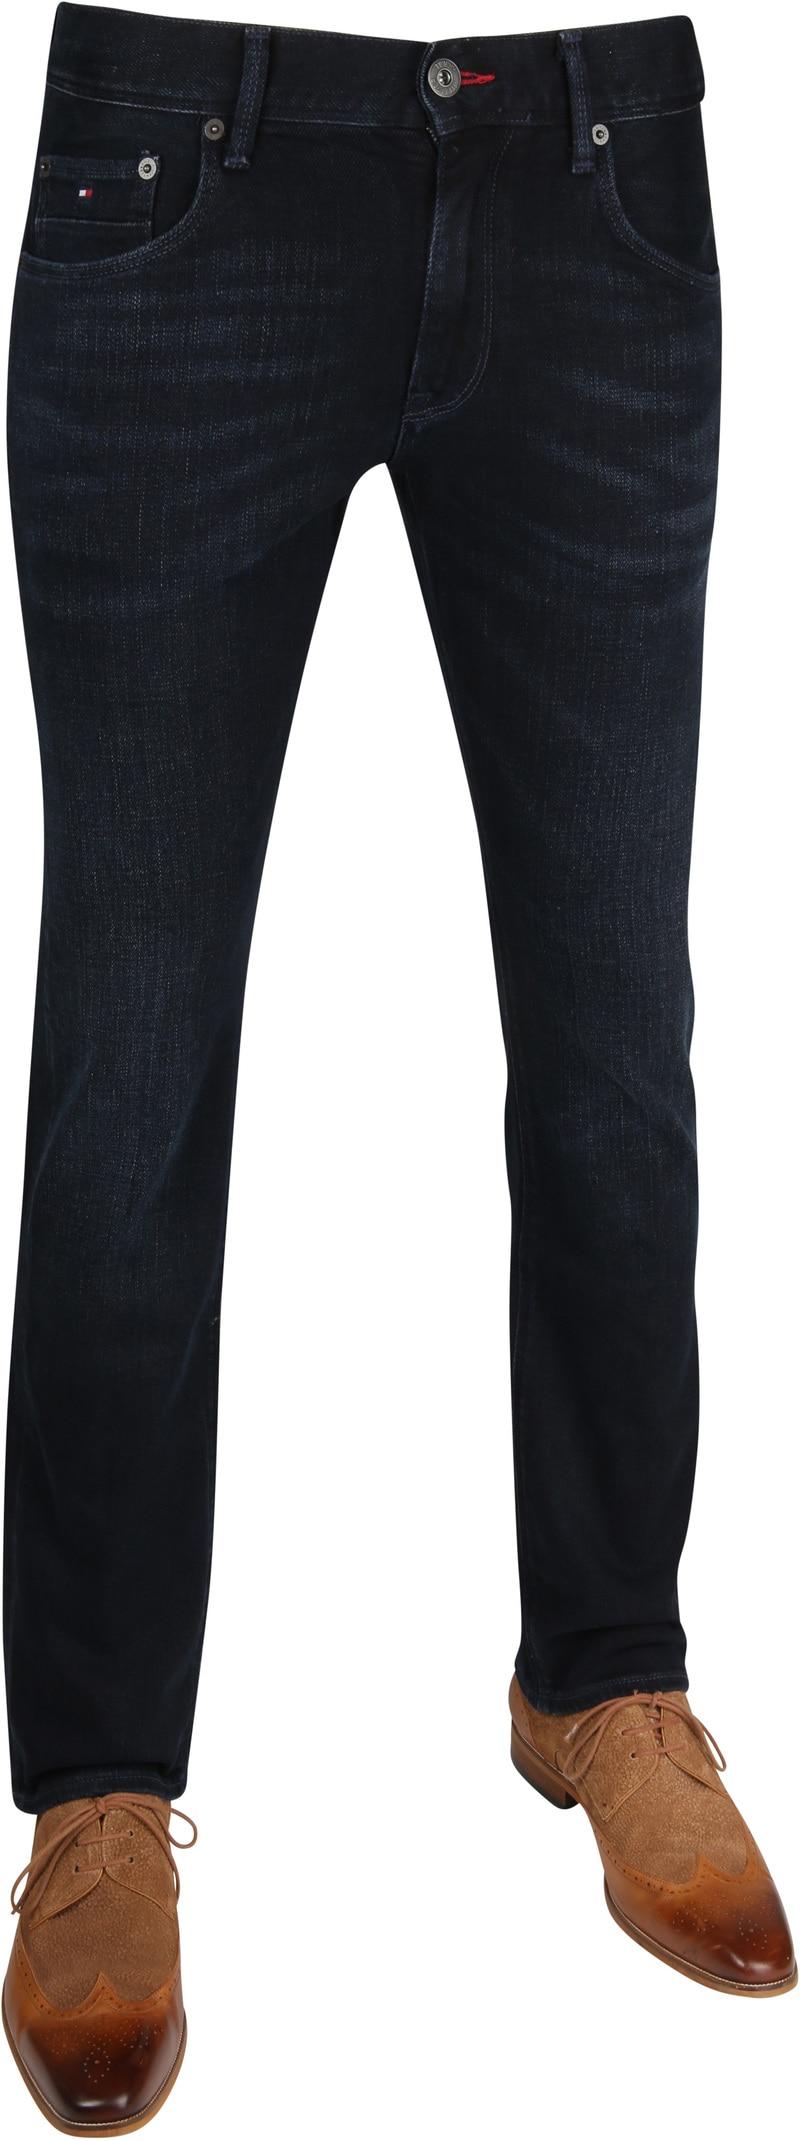 Tommy Hilfiger Core Denton Jeans Navy foto 0